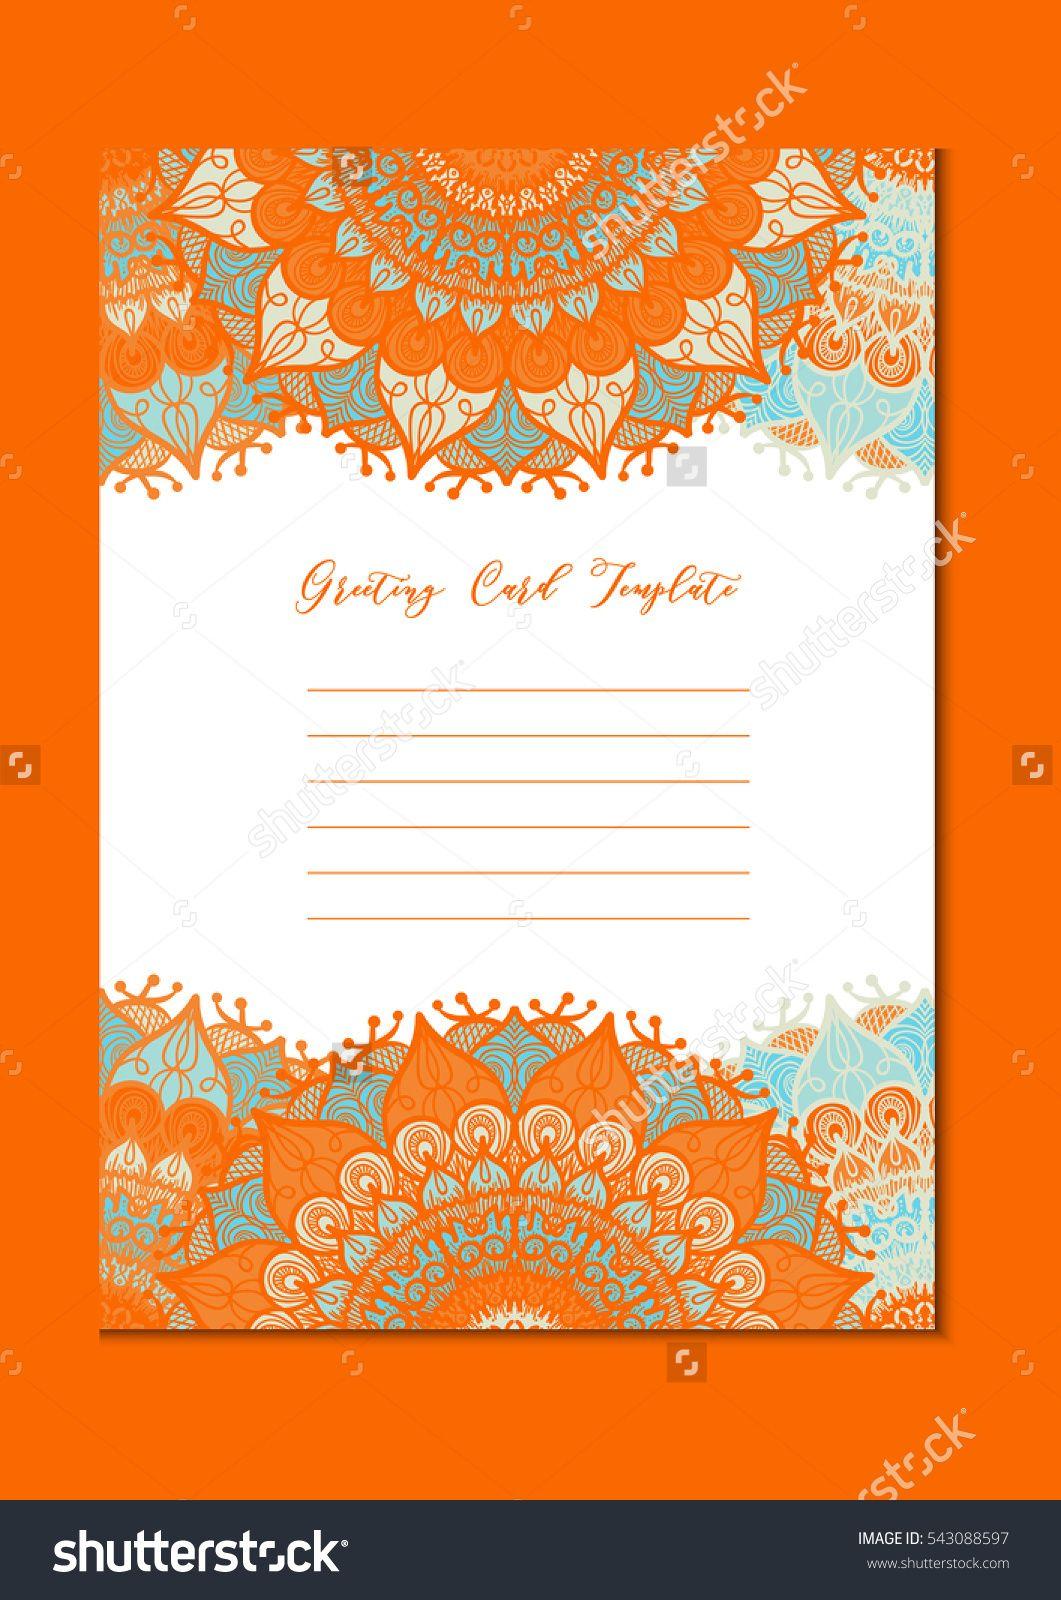 Pin By Anggit Wirawan On Wedding Invitation Inspiration Pinterest